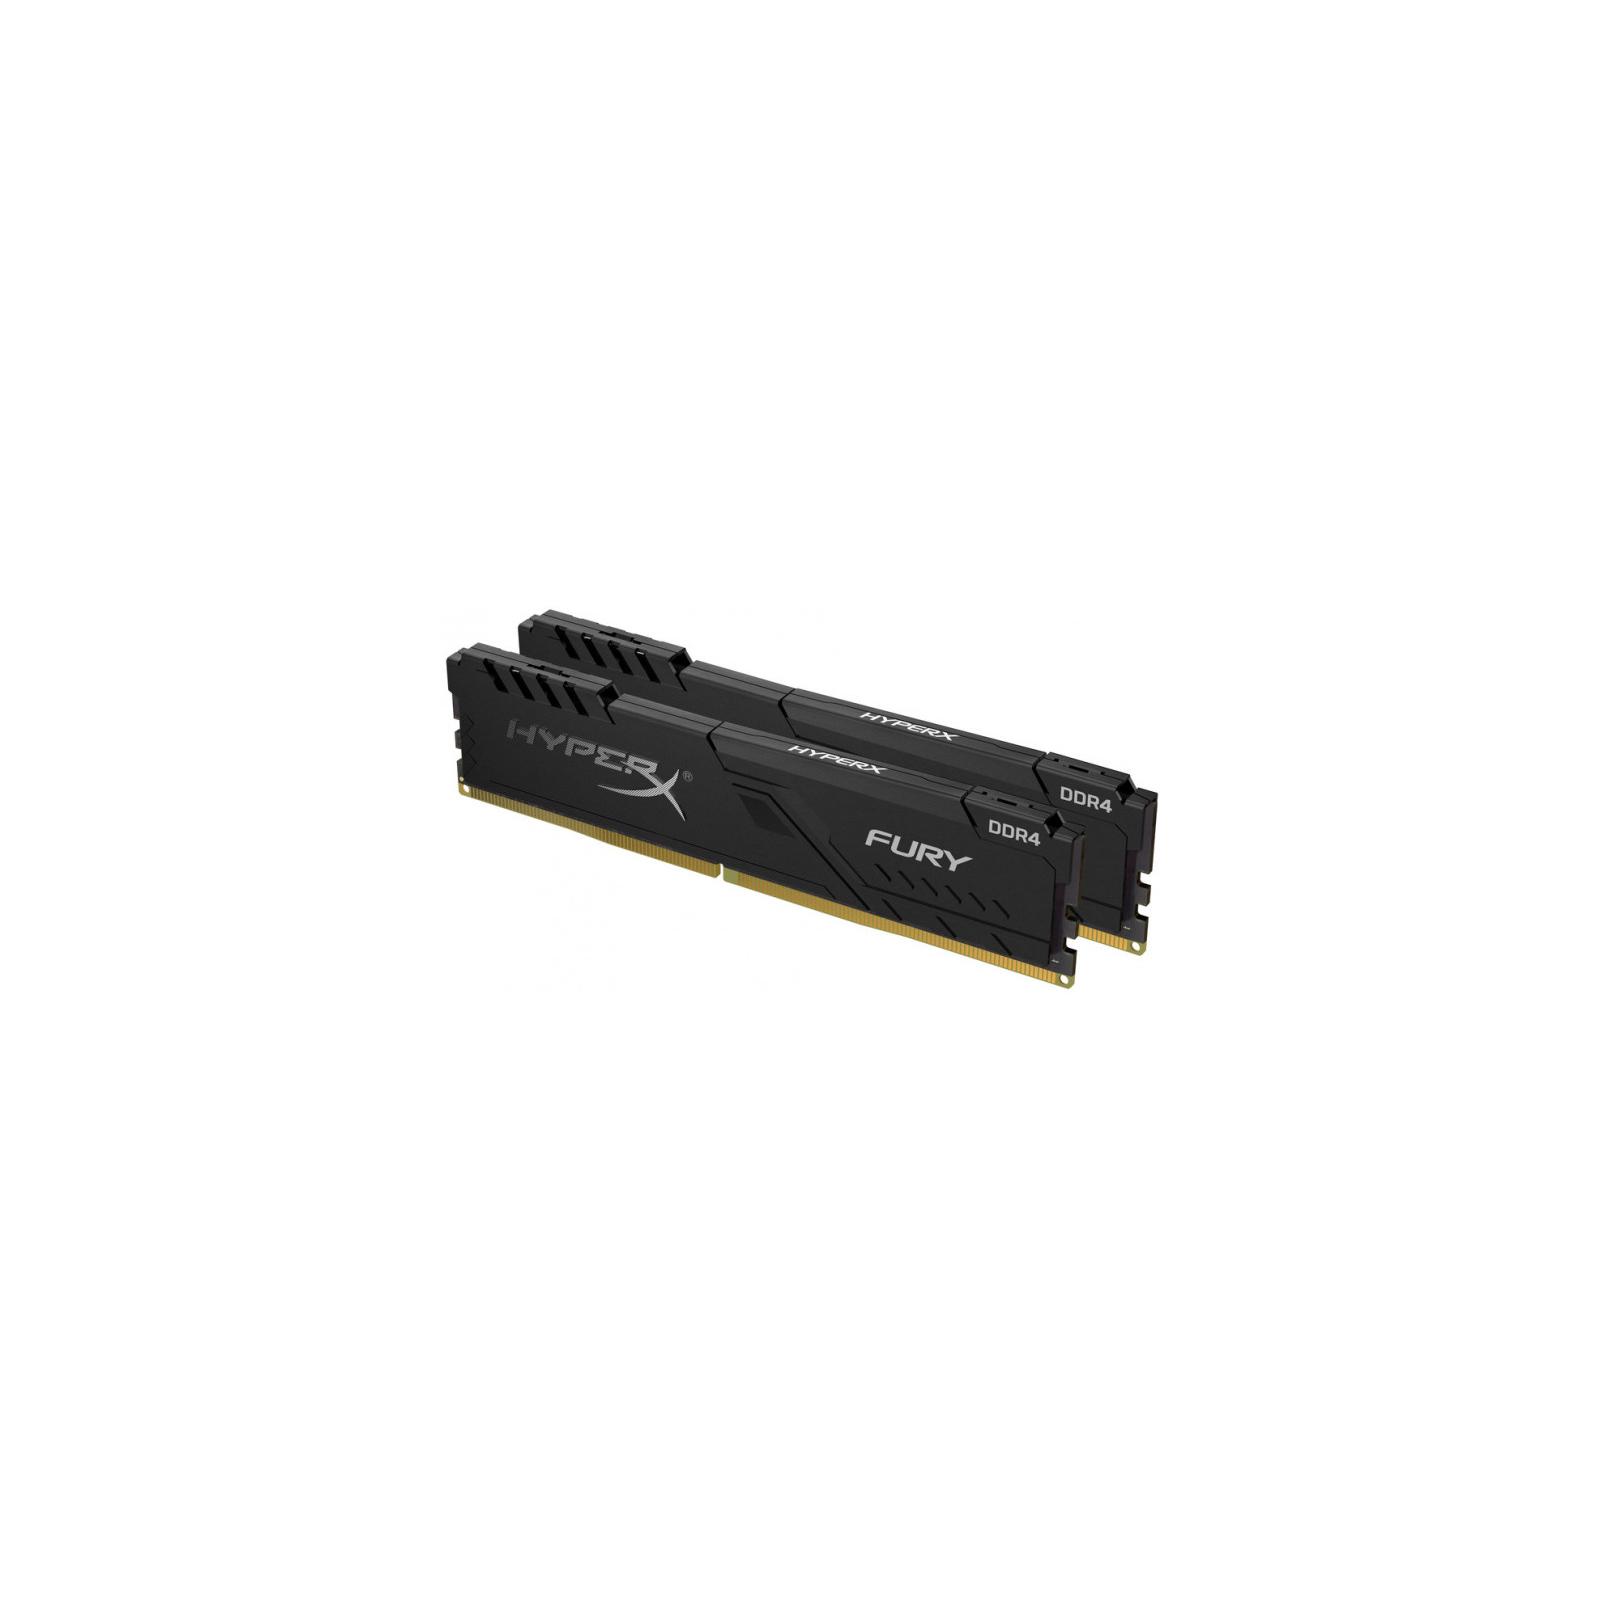 Модуль памяти для компьютера DDR4 16GB (2x8GB) 2666 MHz HyperX Fury Black HyperX (Kingston Fury) (HX426C16FB3K2/16)